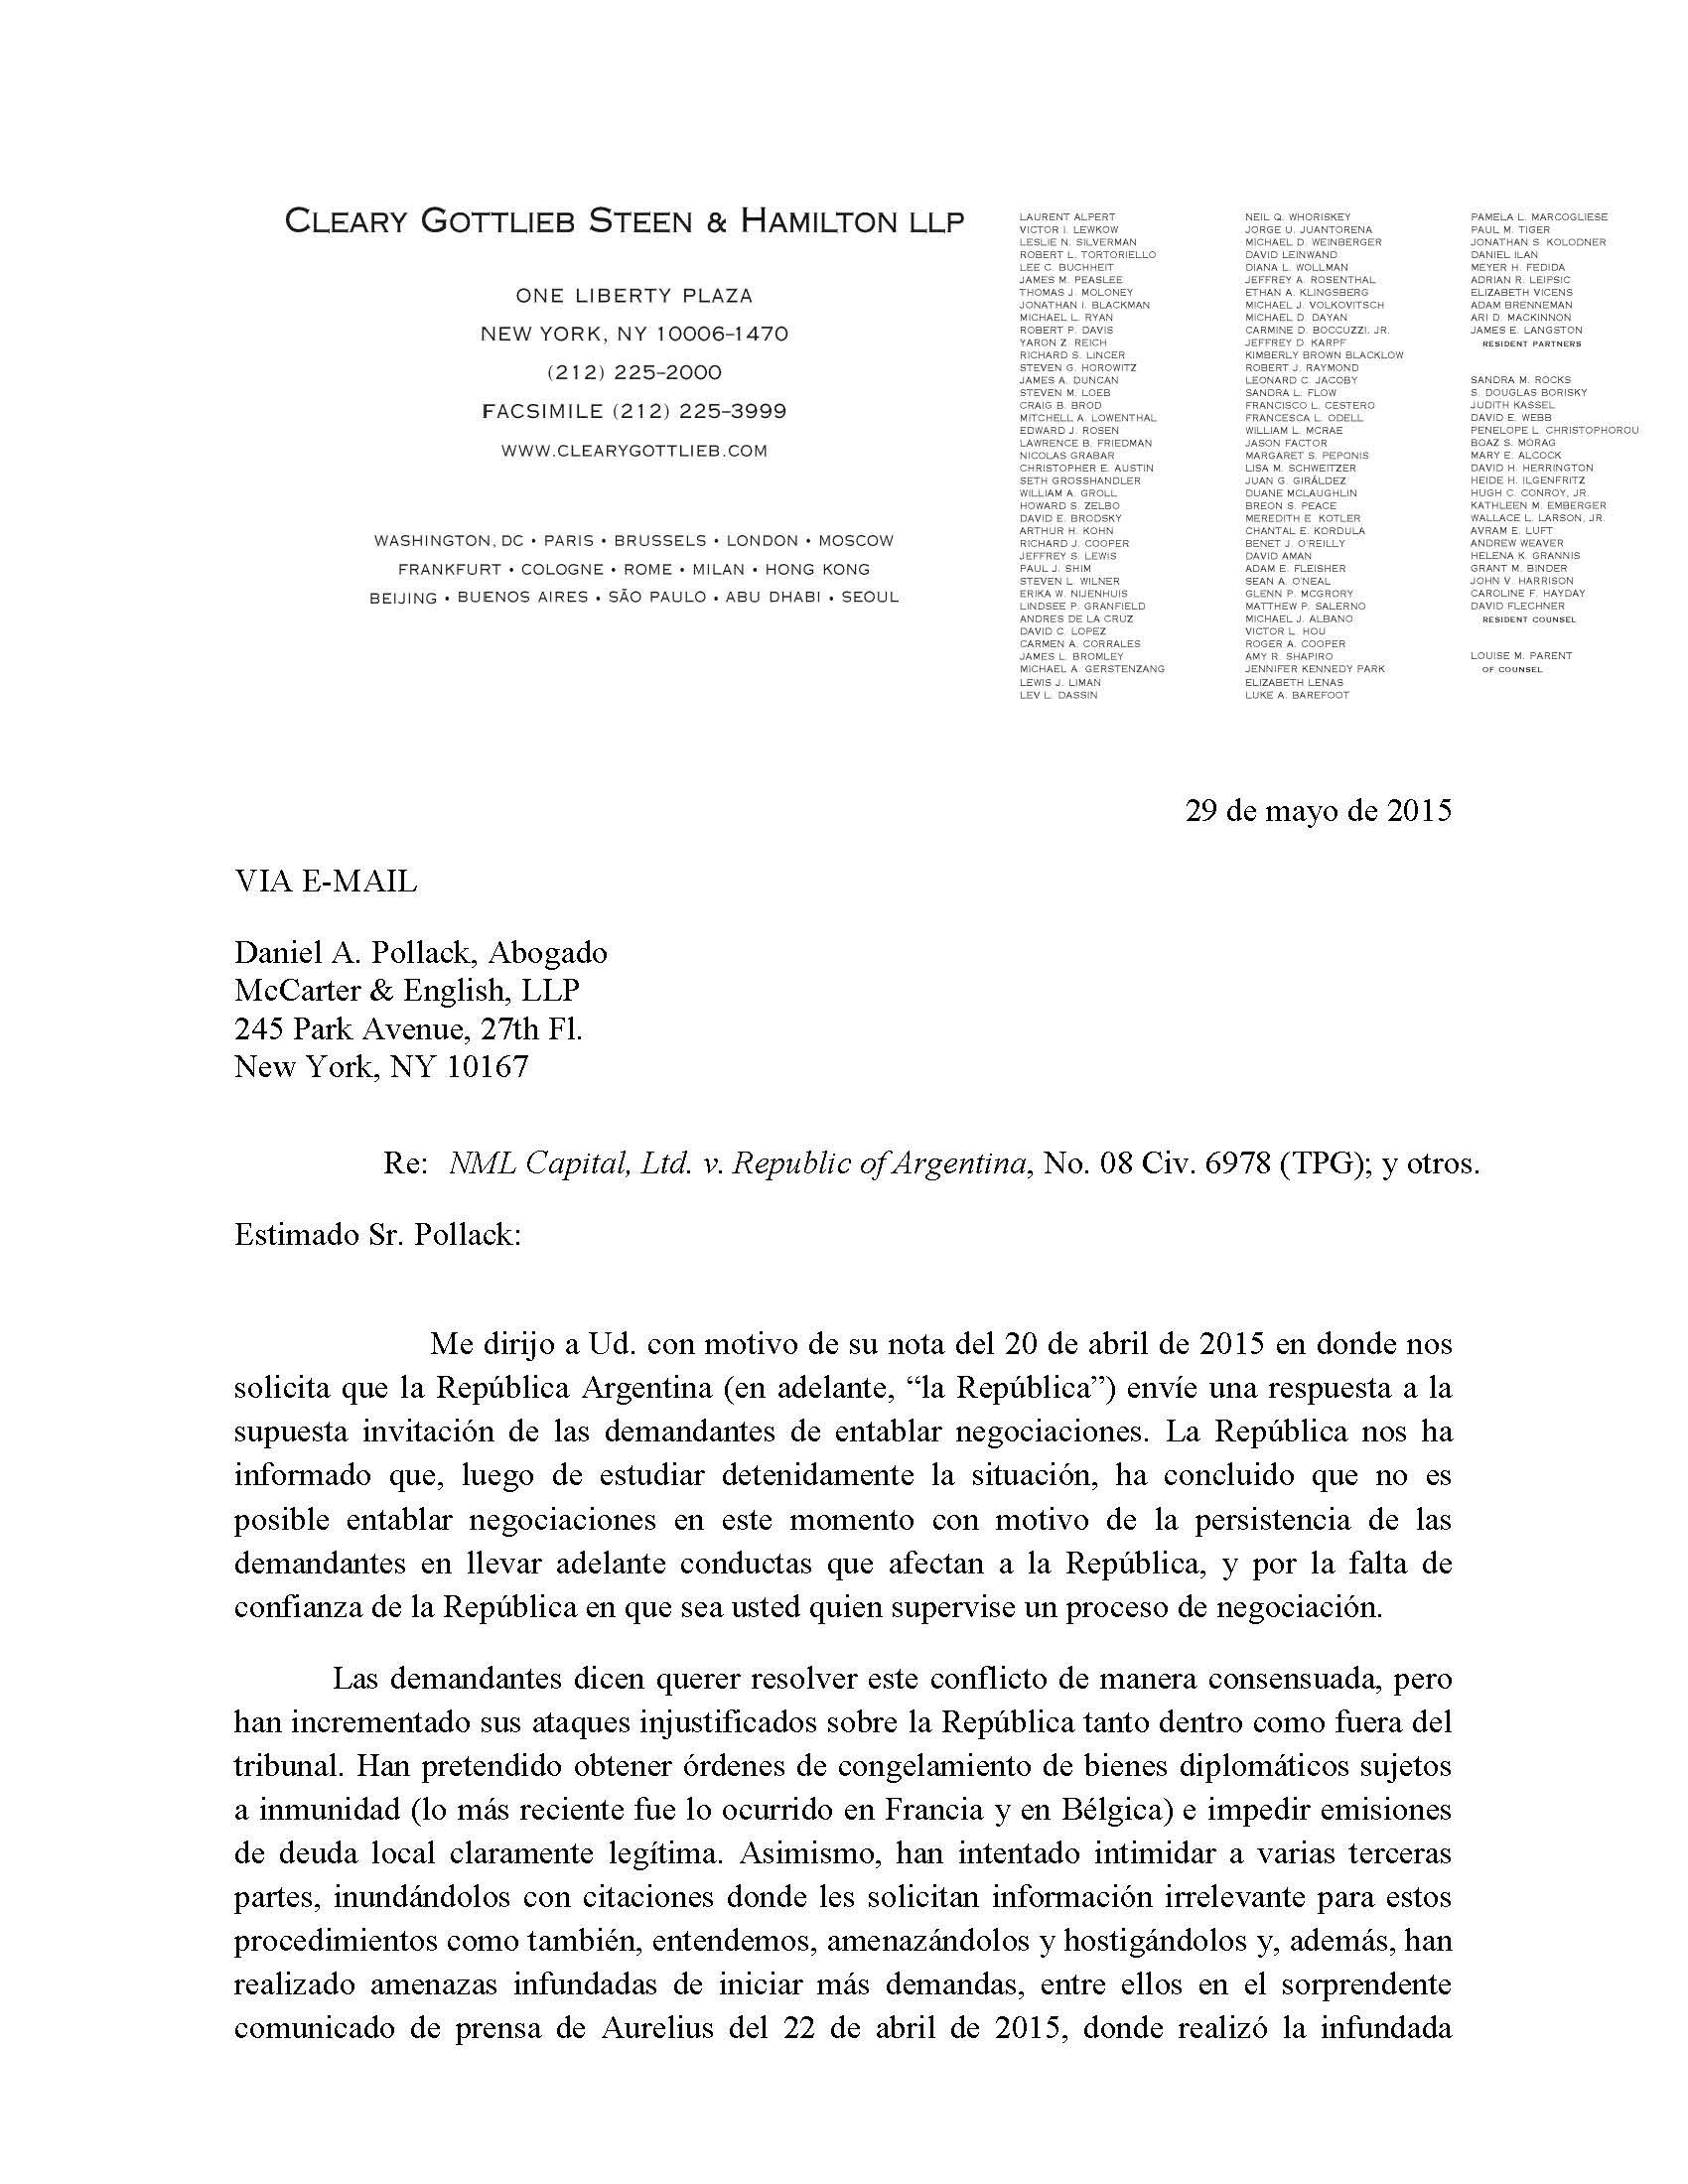 Carta a Pollack - Español_Page_1